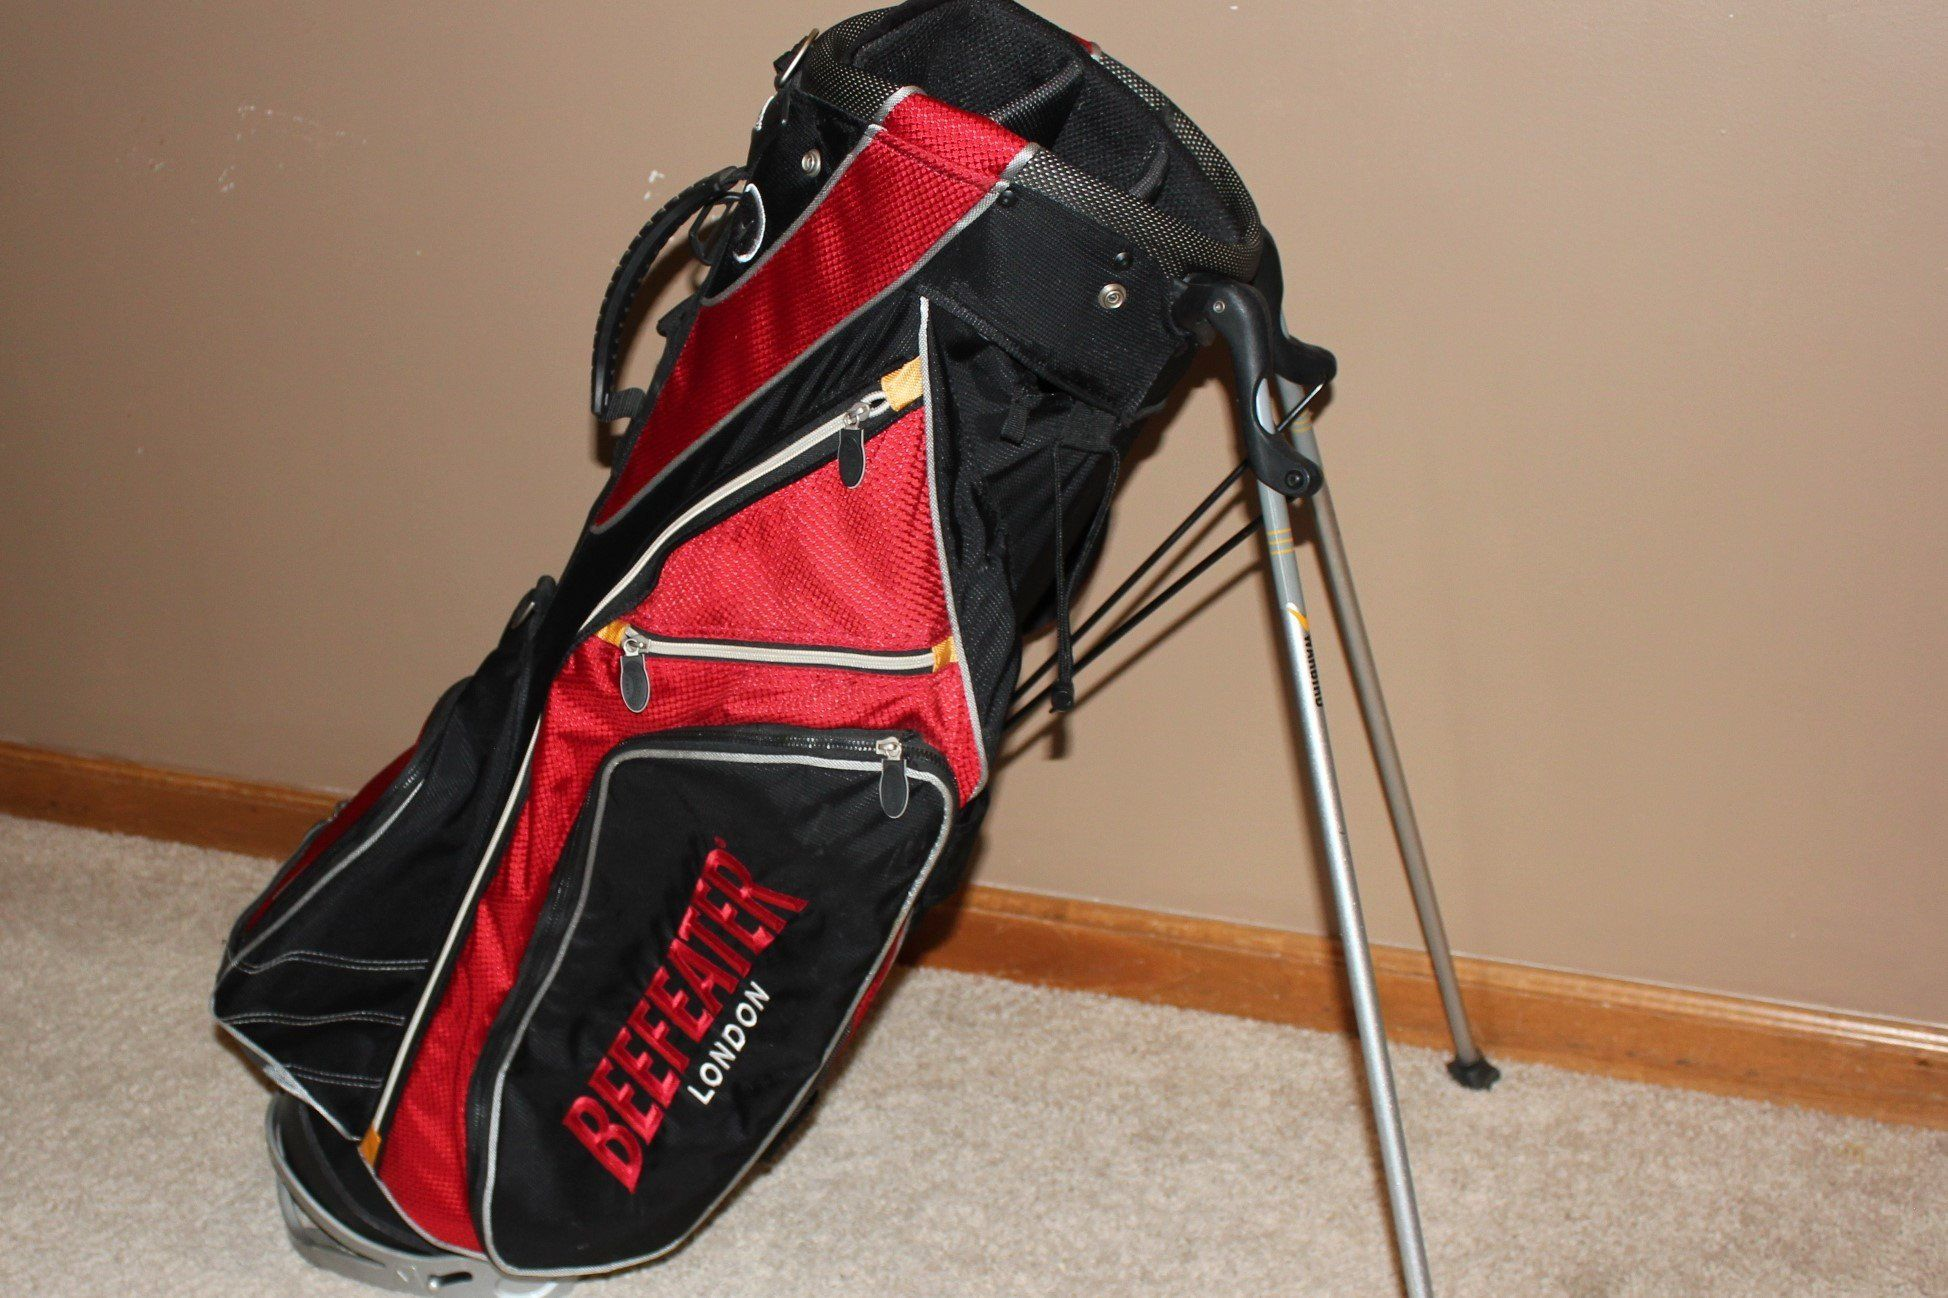 16++ Budweiser golf bag for sale ideas